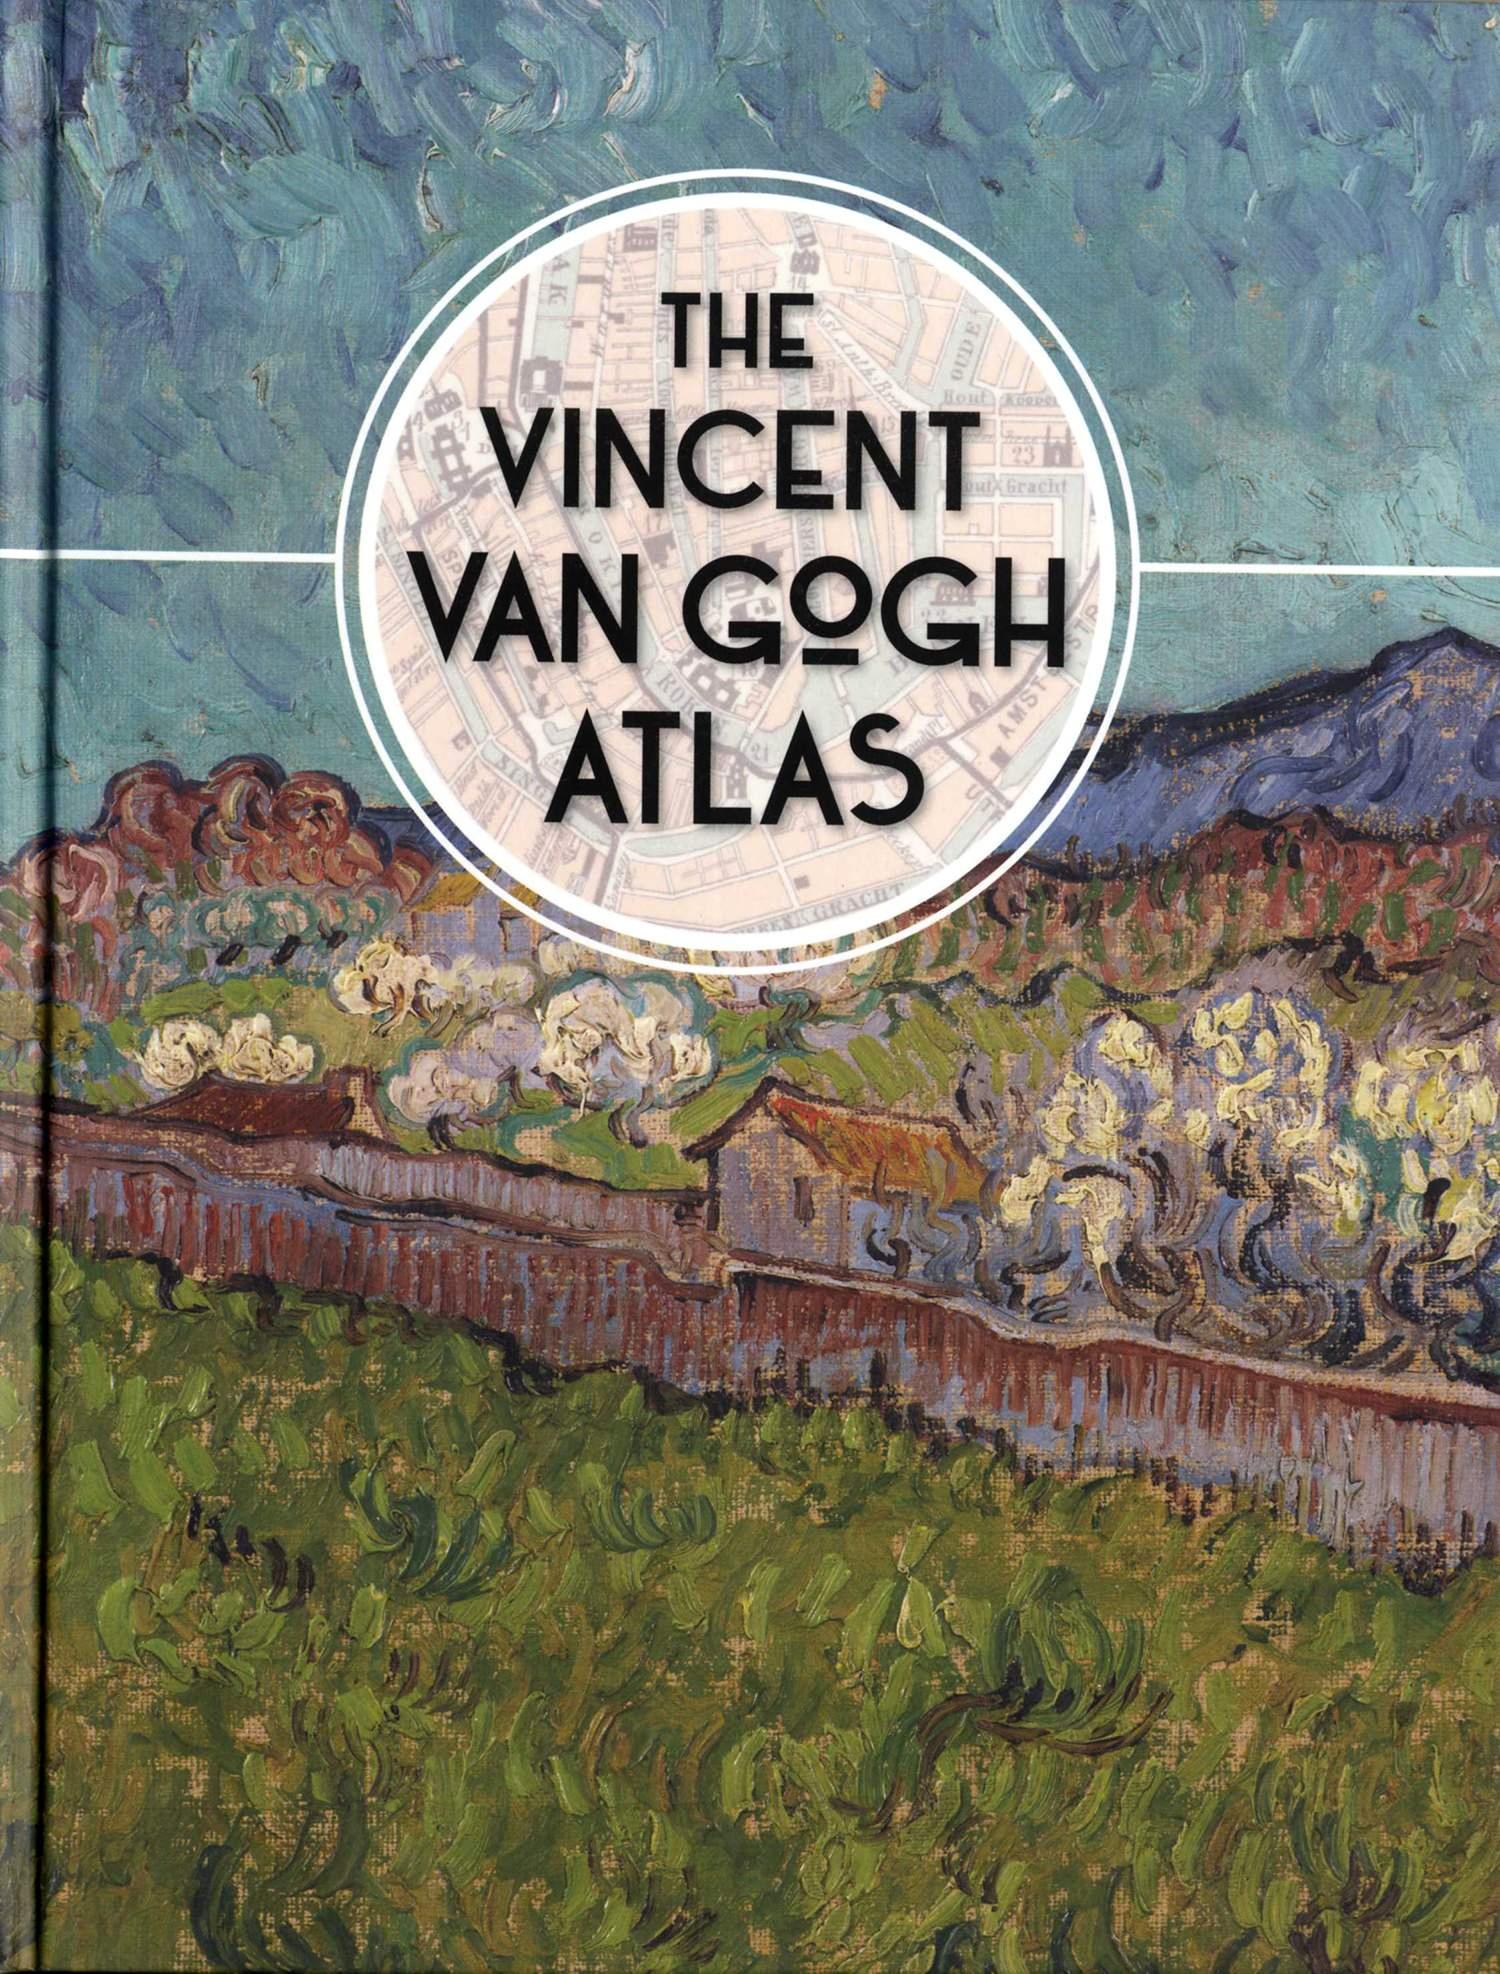 Van Gogh Atlas